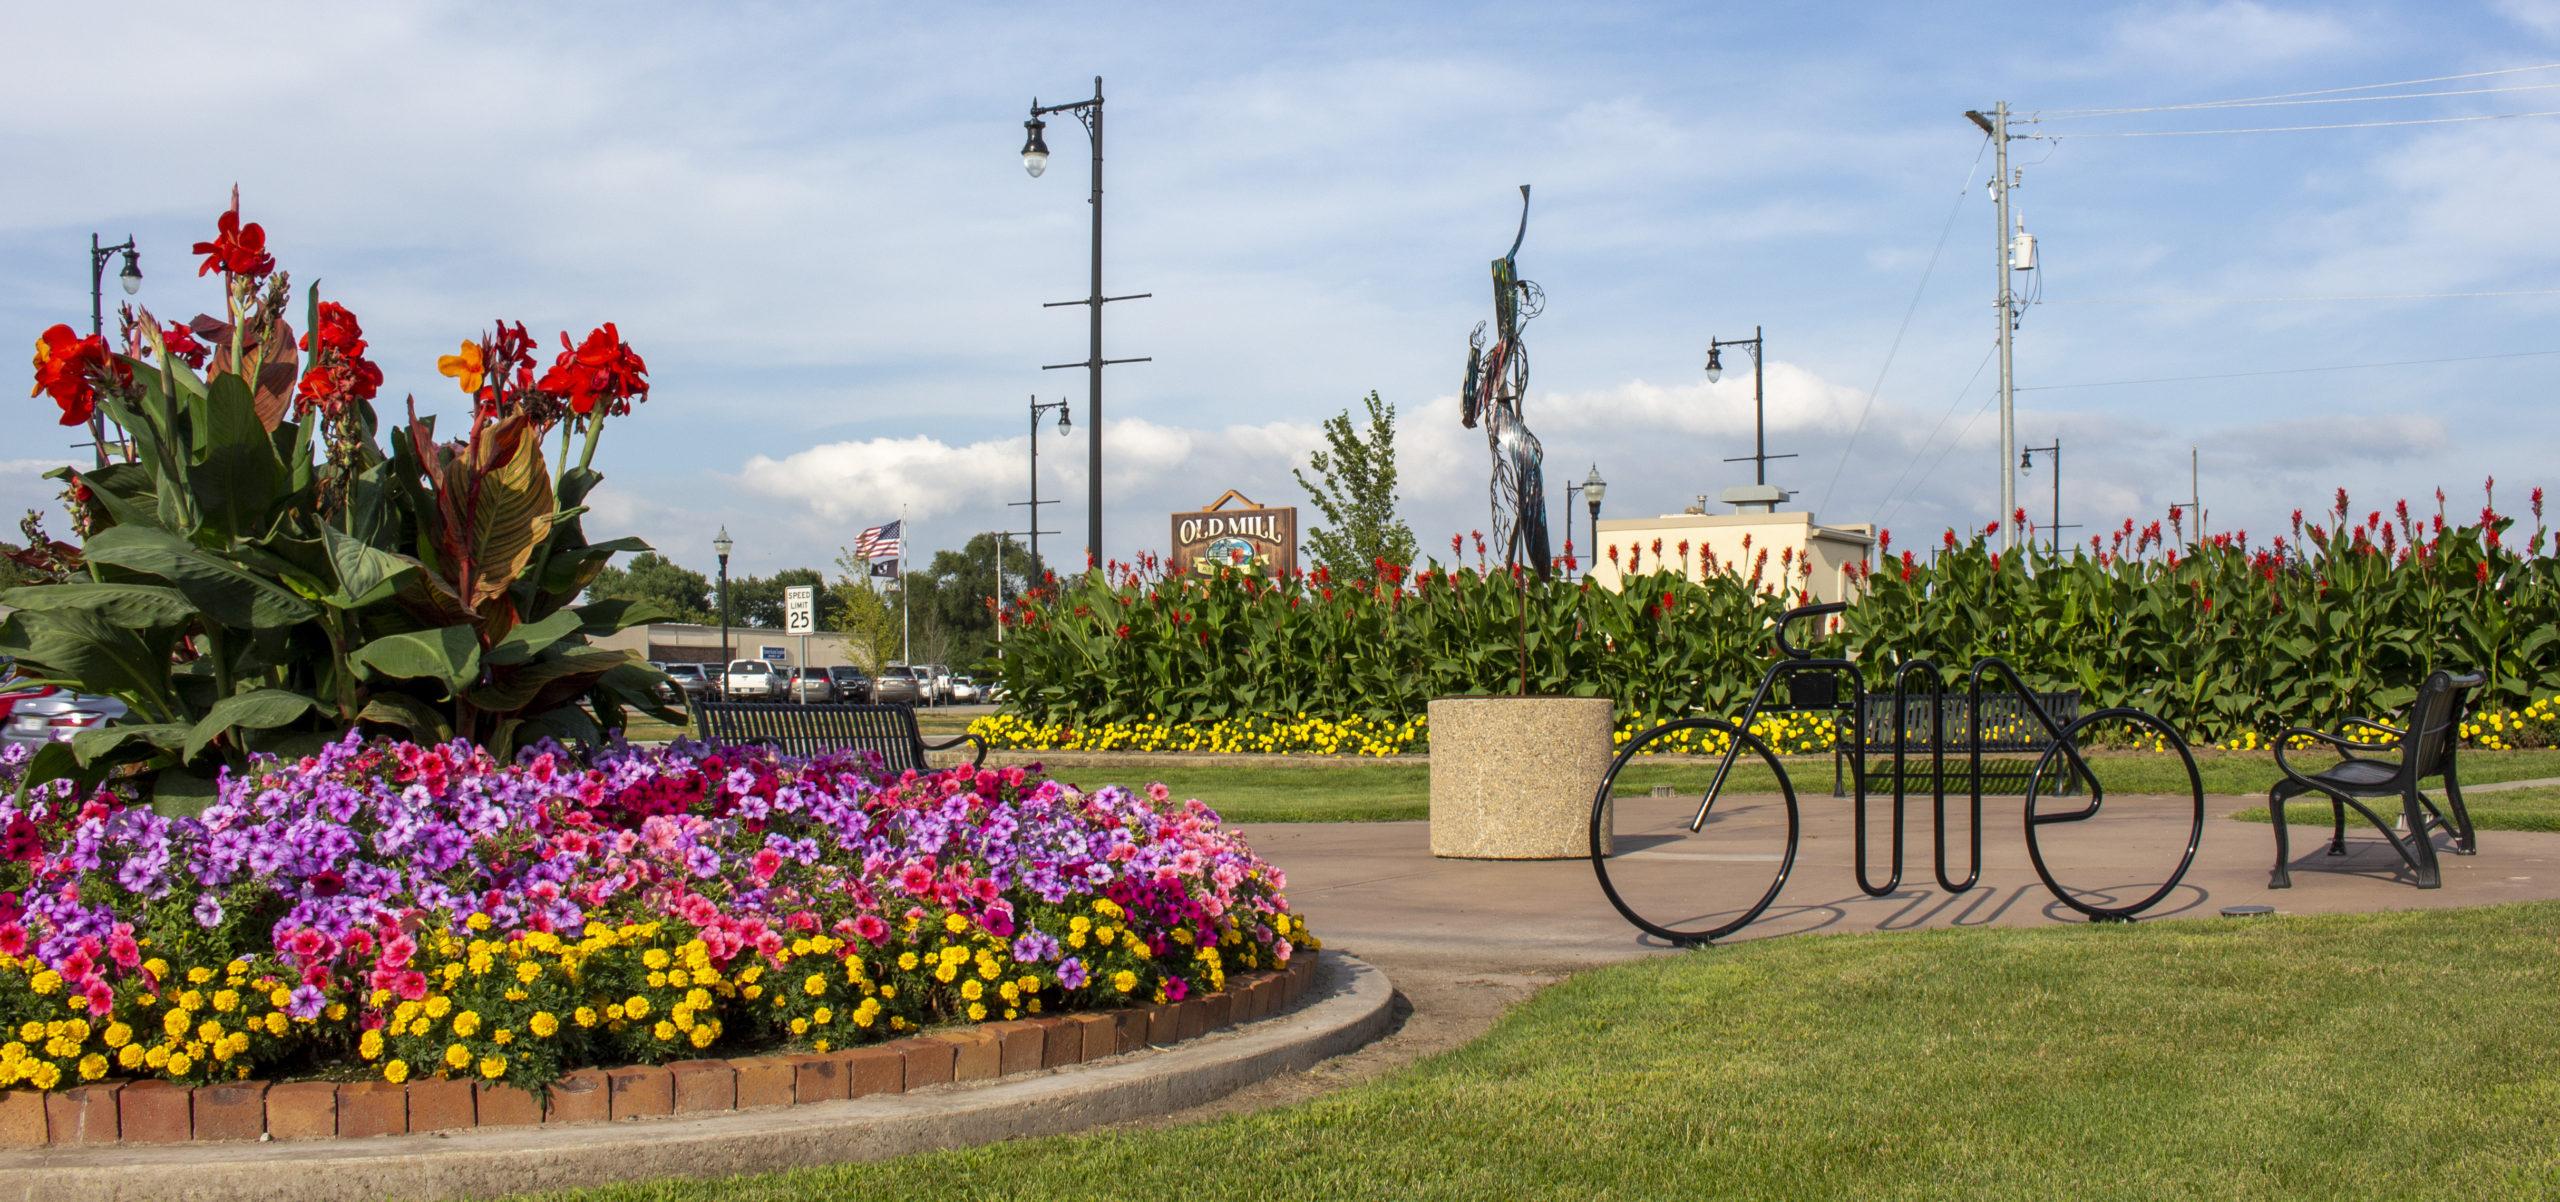 Downtown Norfolk, Nebraska